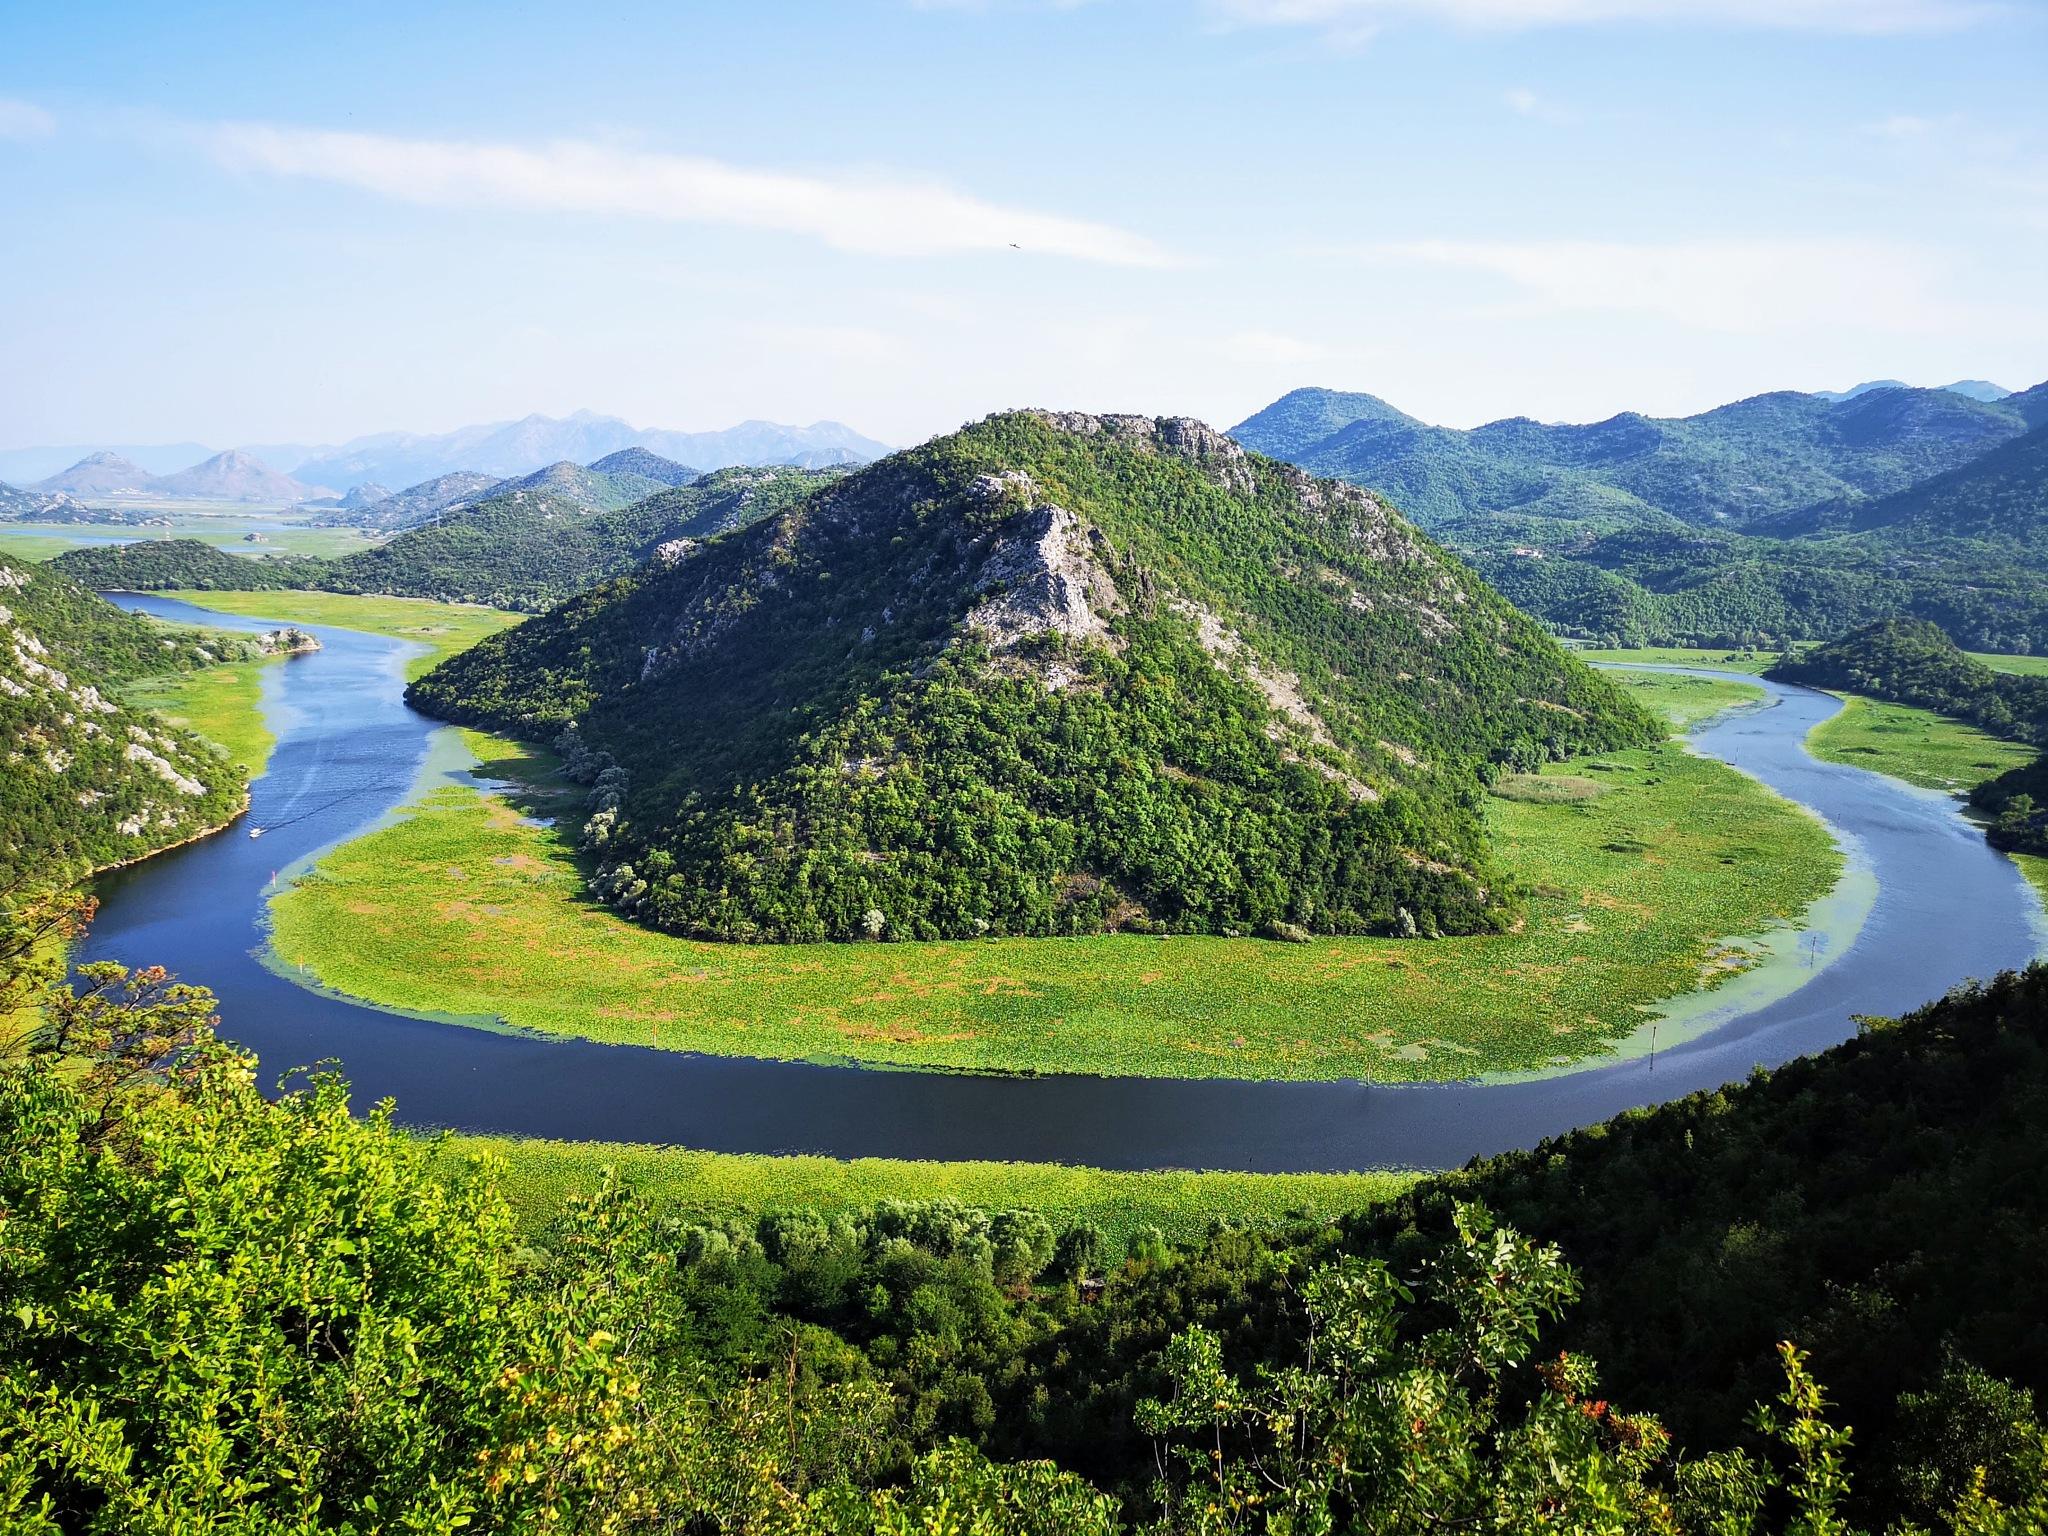 Where the river turns... by Kasia Michalska